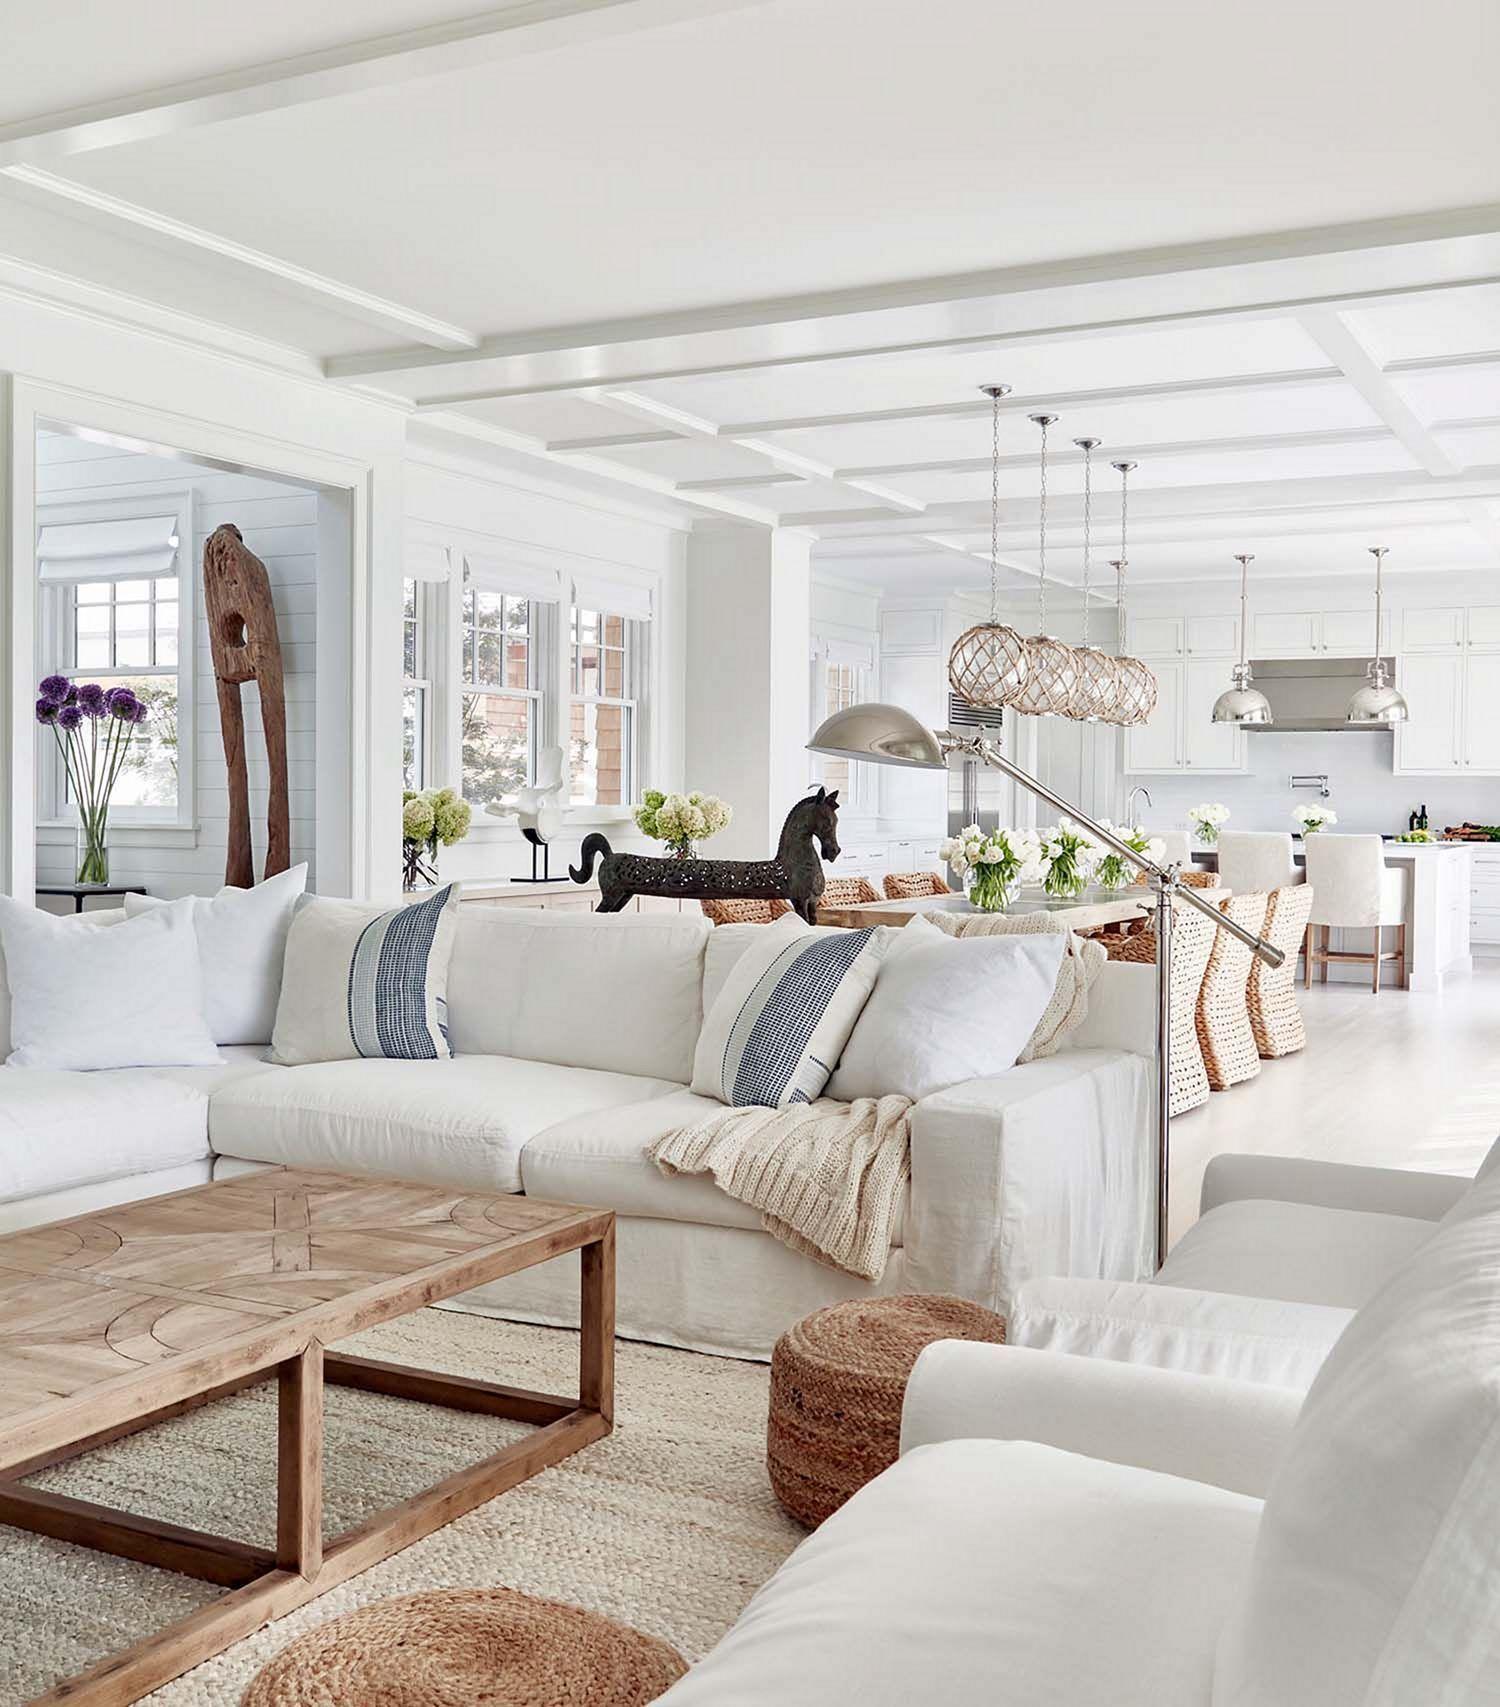 Elegant White Beach House Ideas 019 Farm House Living Room Beach House Interior Design Beach House Interior